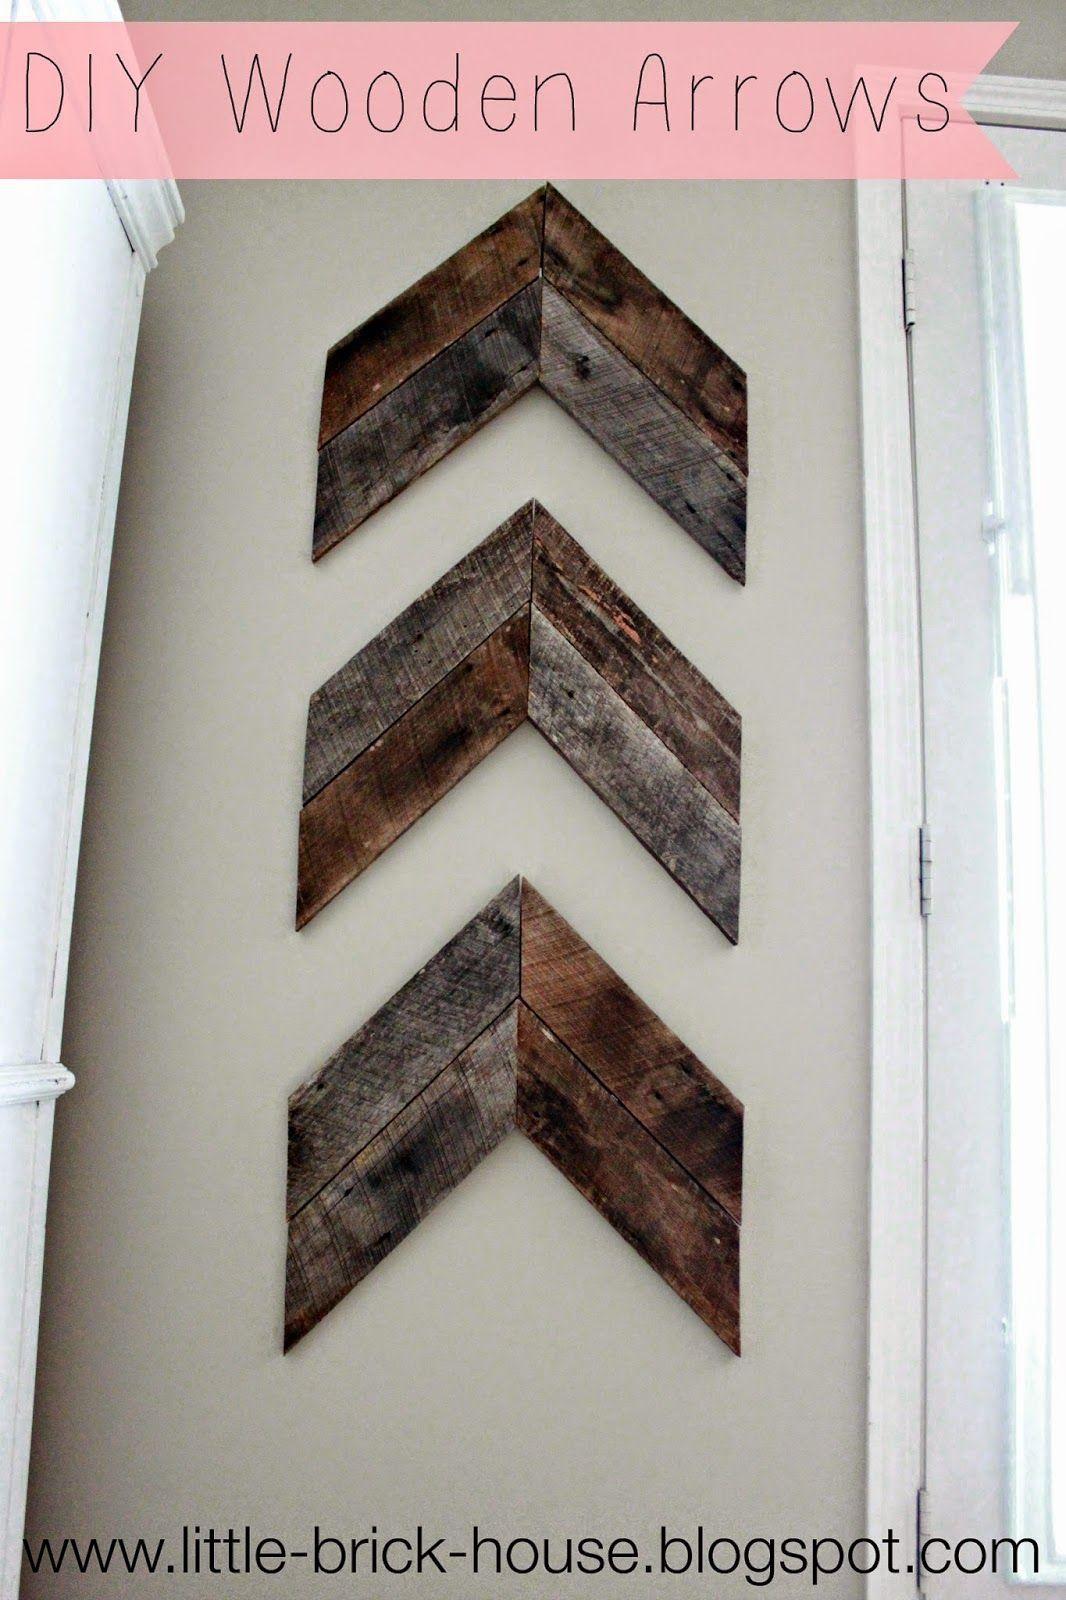 Little brick house reclaimed wood project diy wooden arrows